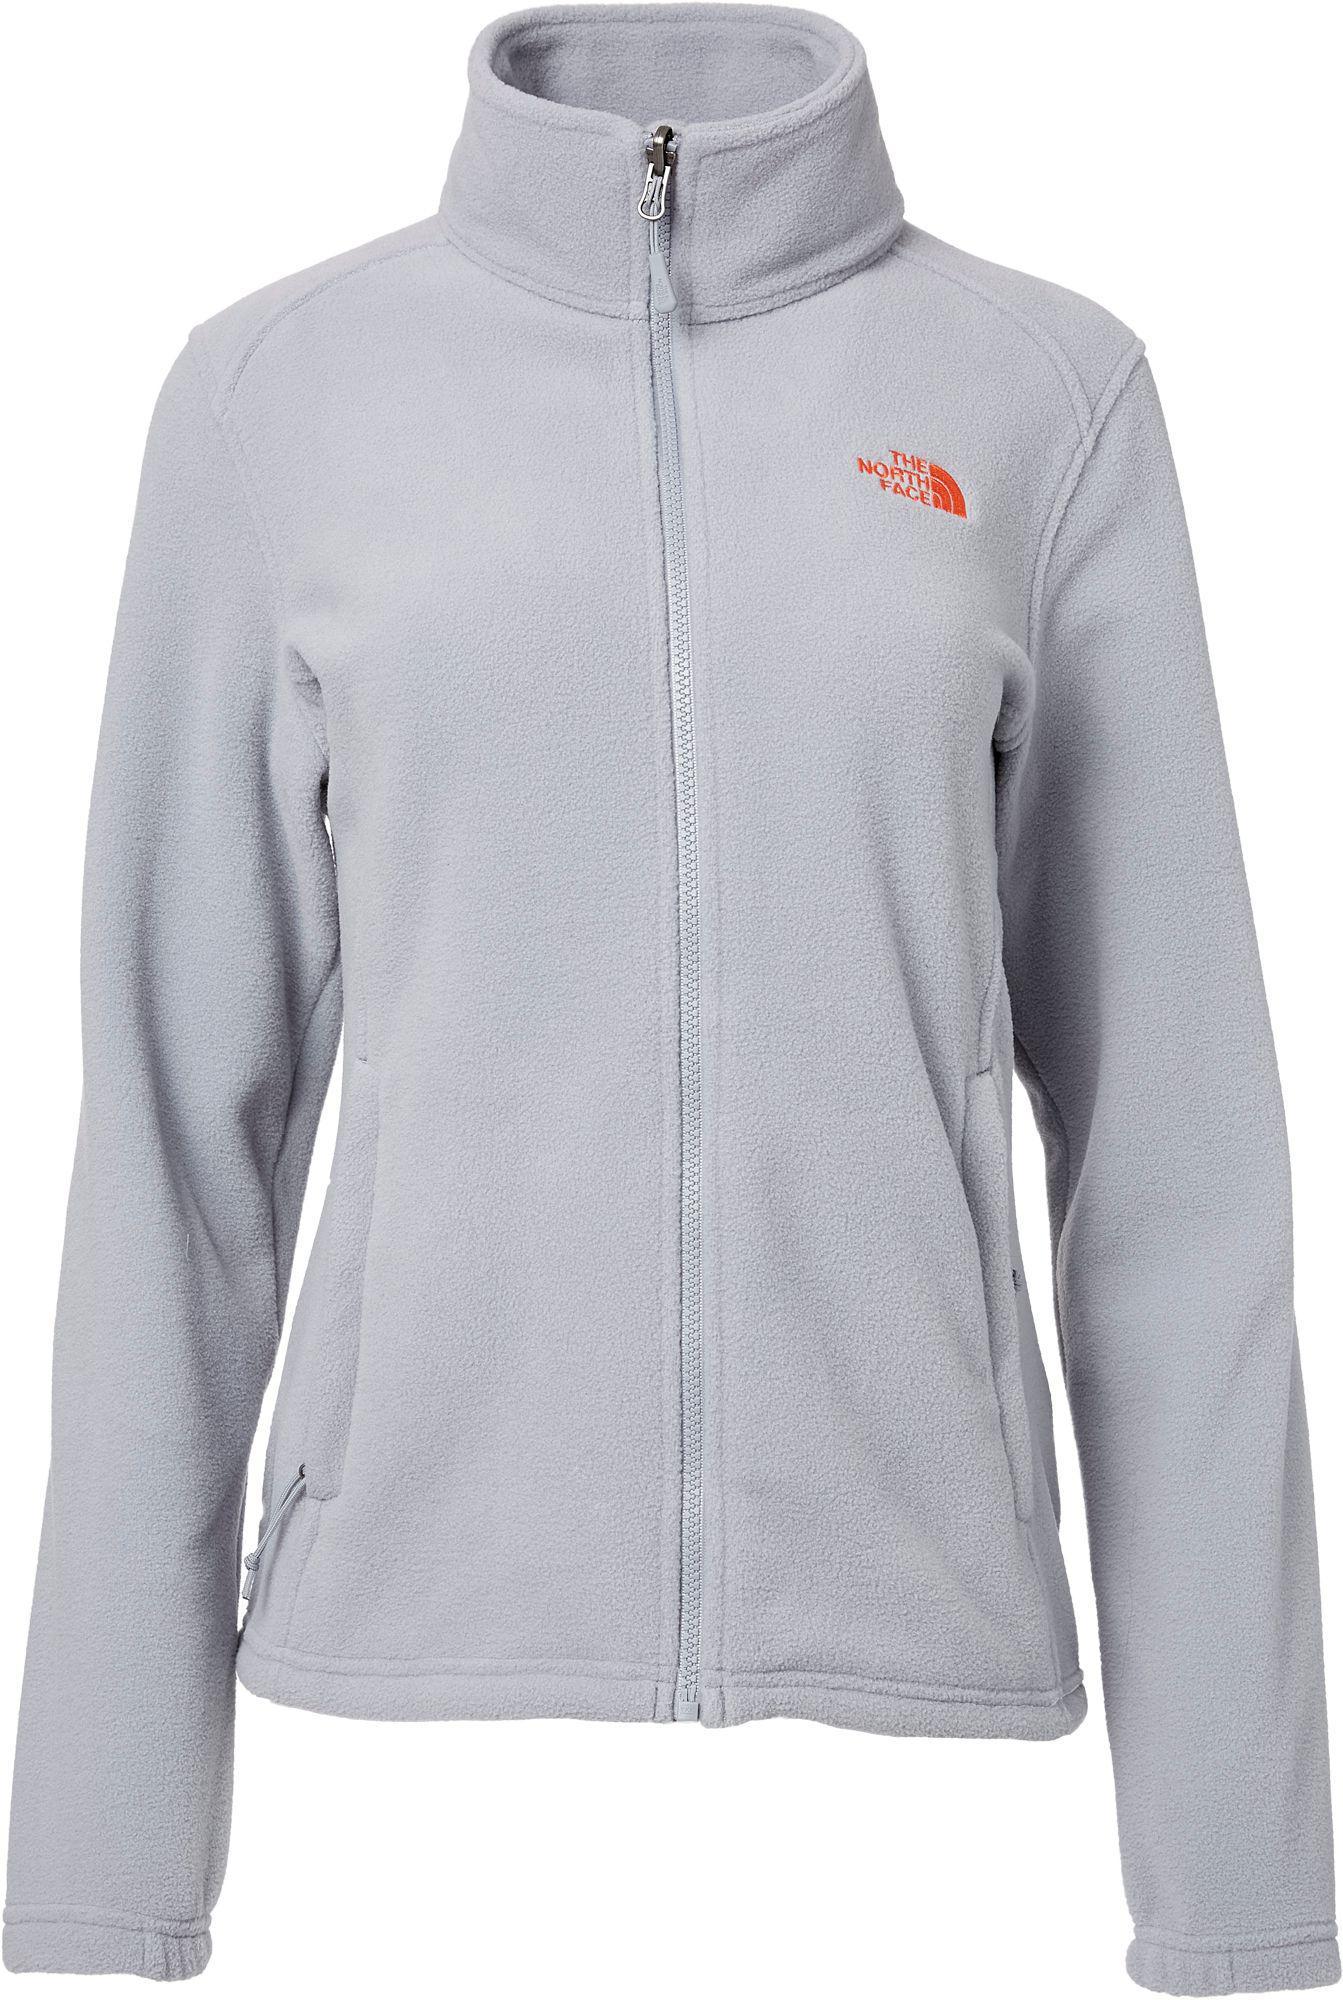 a03b86e465a Lyst - The North Face Khumbu 2 Fleece Jacket in Gray